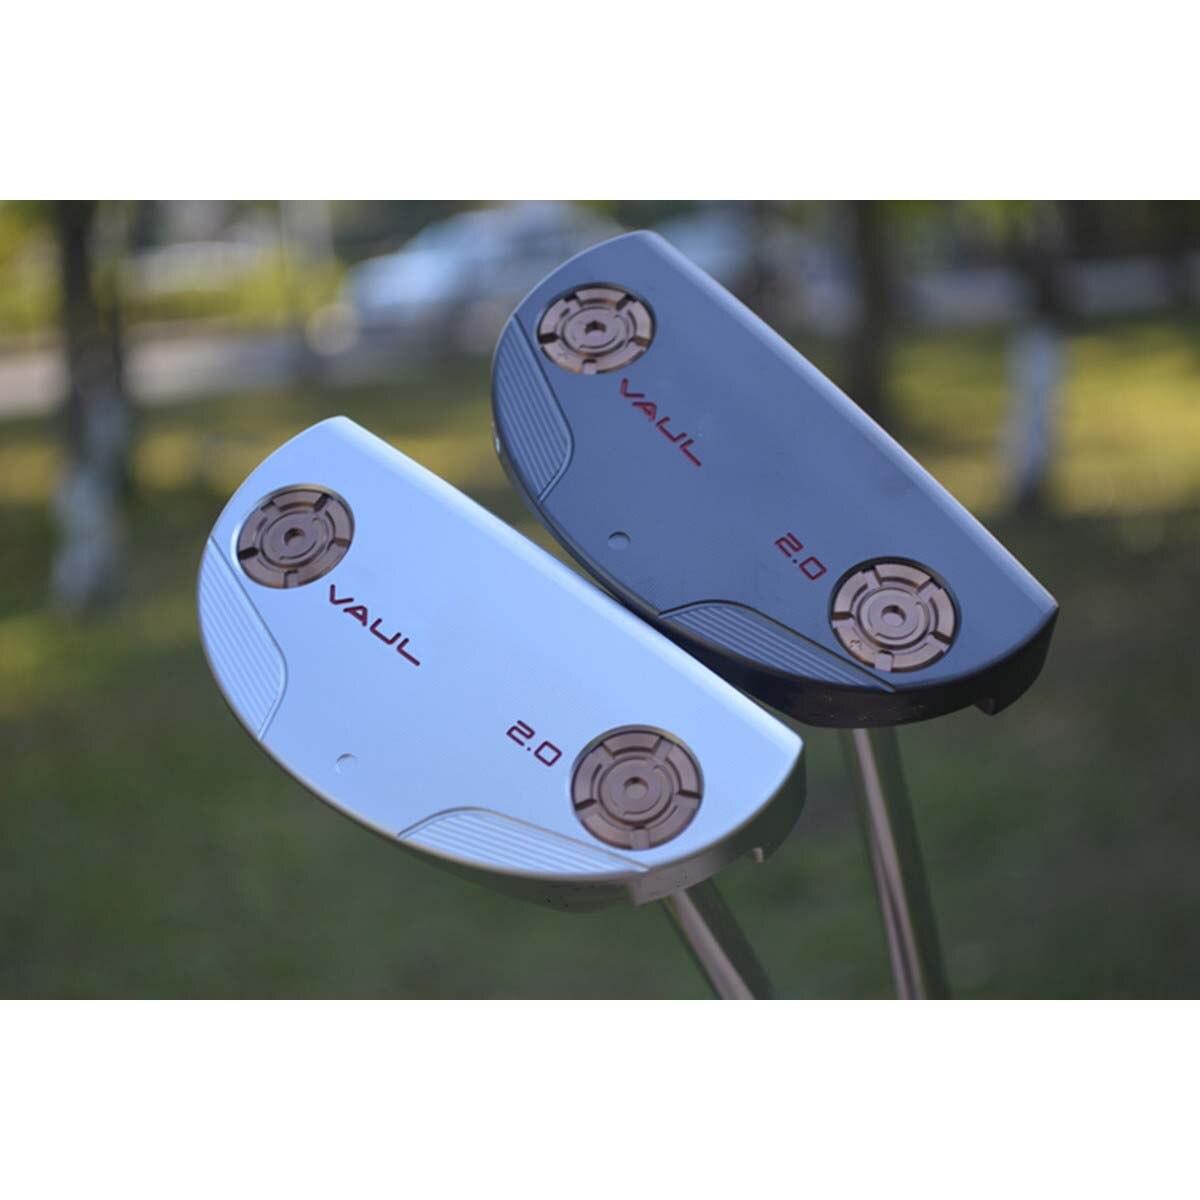 Golf Putter vaul 2.0 with Semi-circular Putter Golf Club Soft Iron Forging with Logo